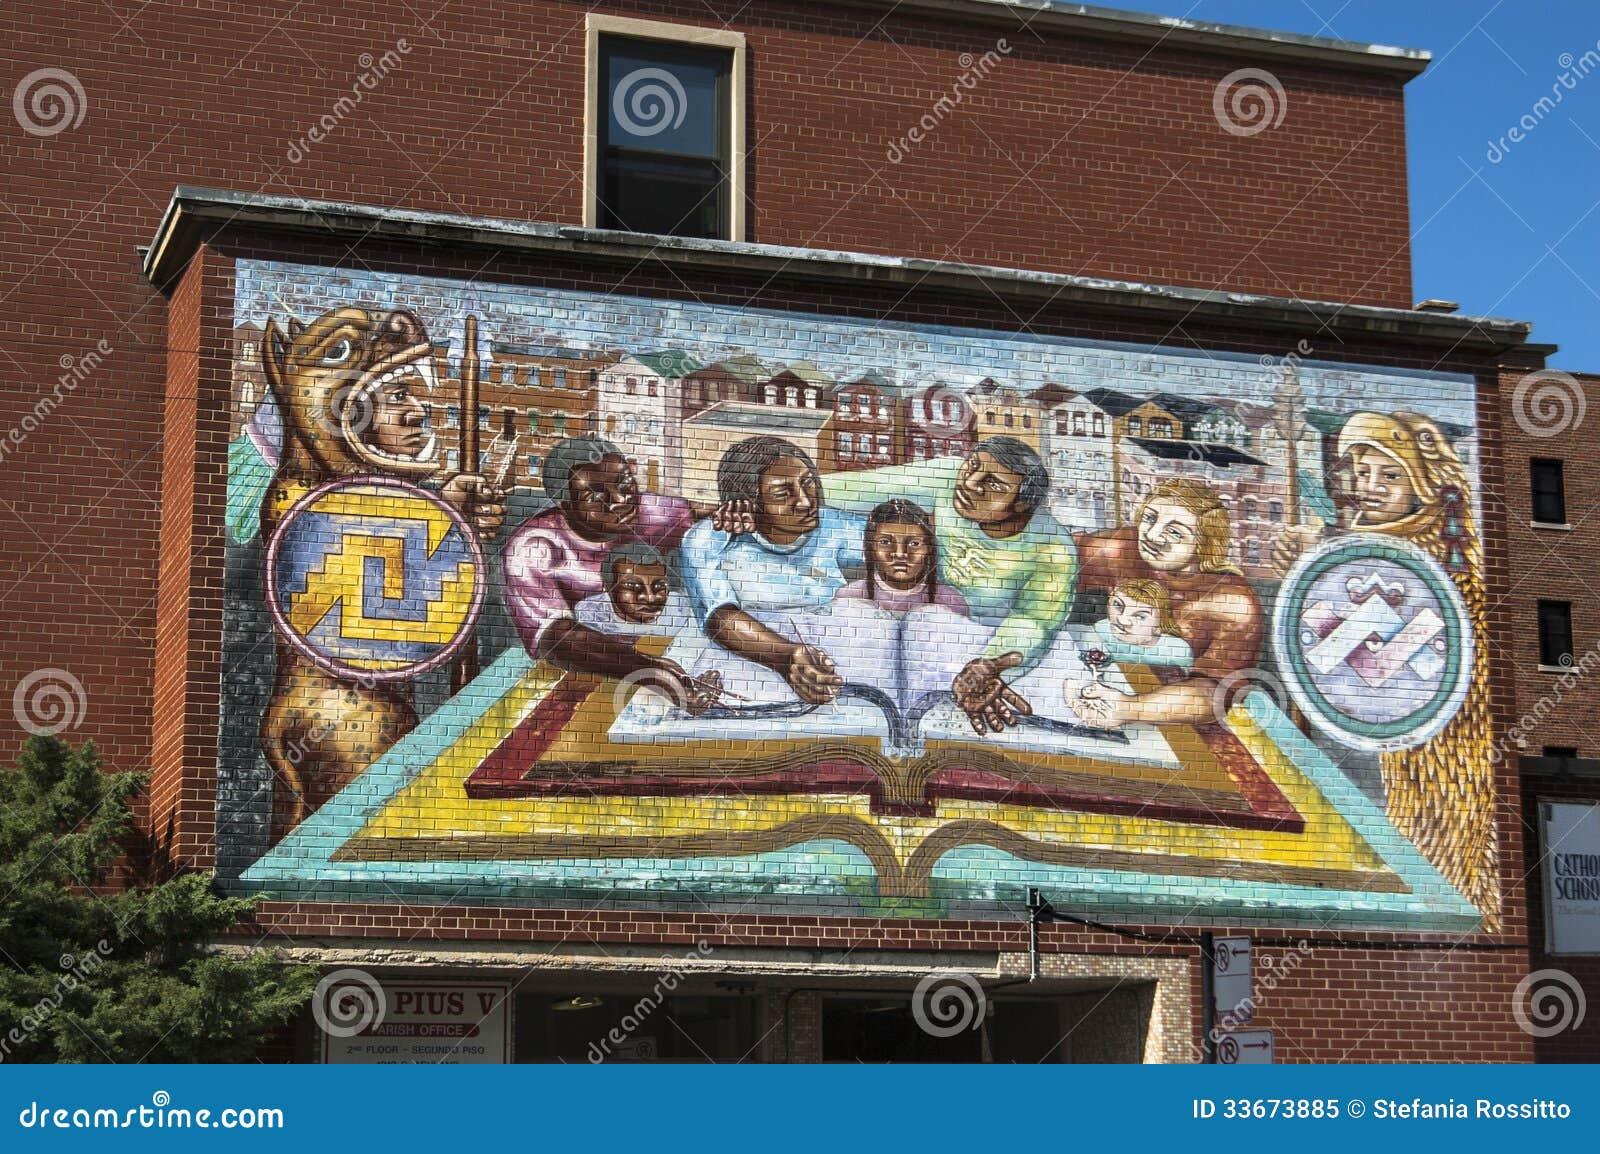 murals in chicago editorial image image 33673885 building chicago murals